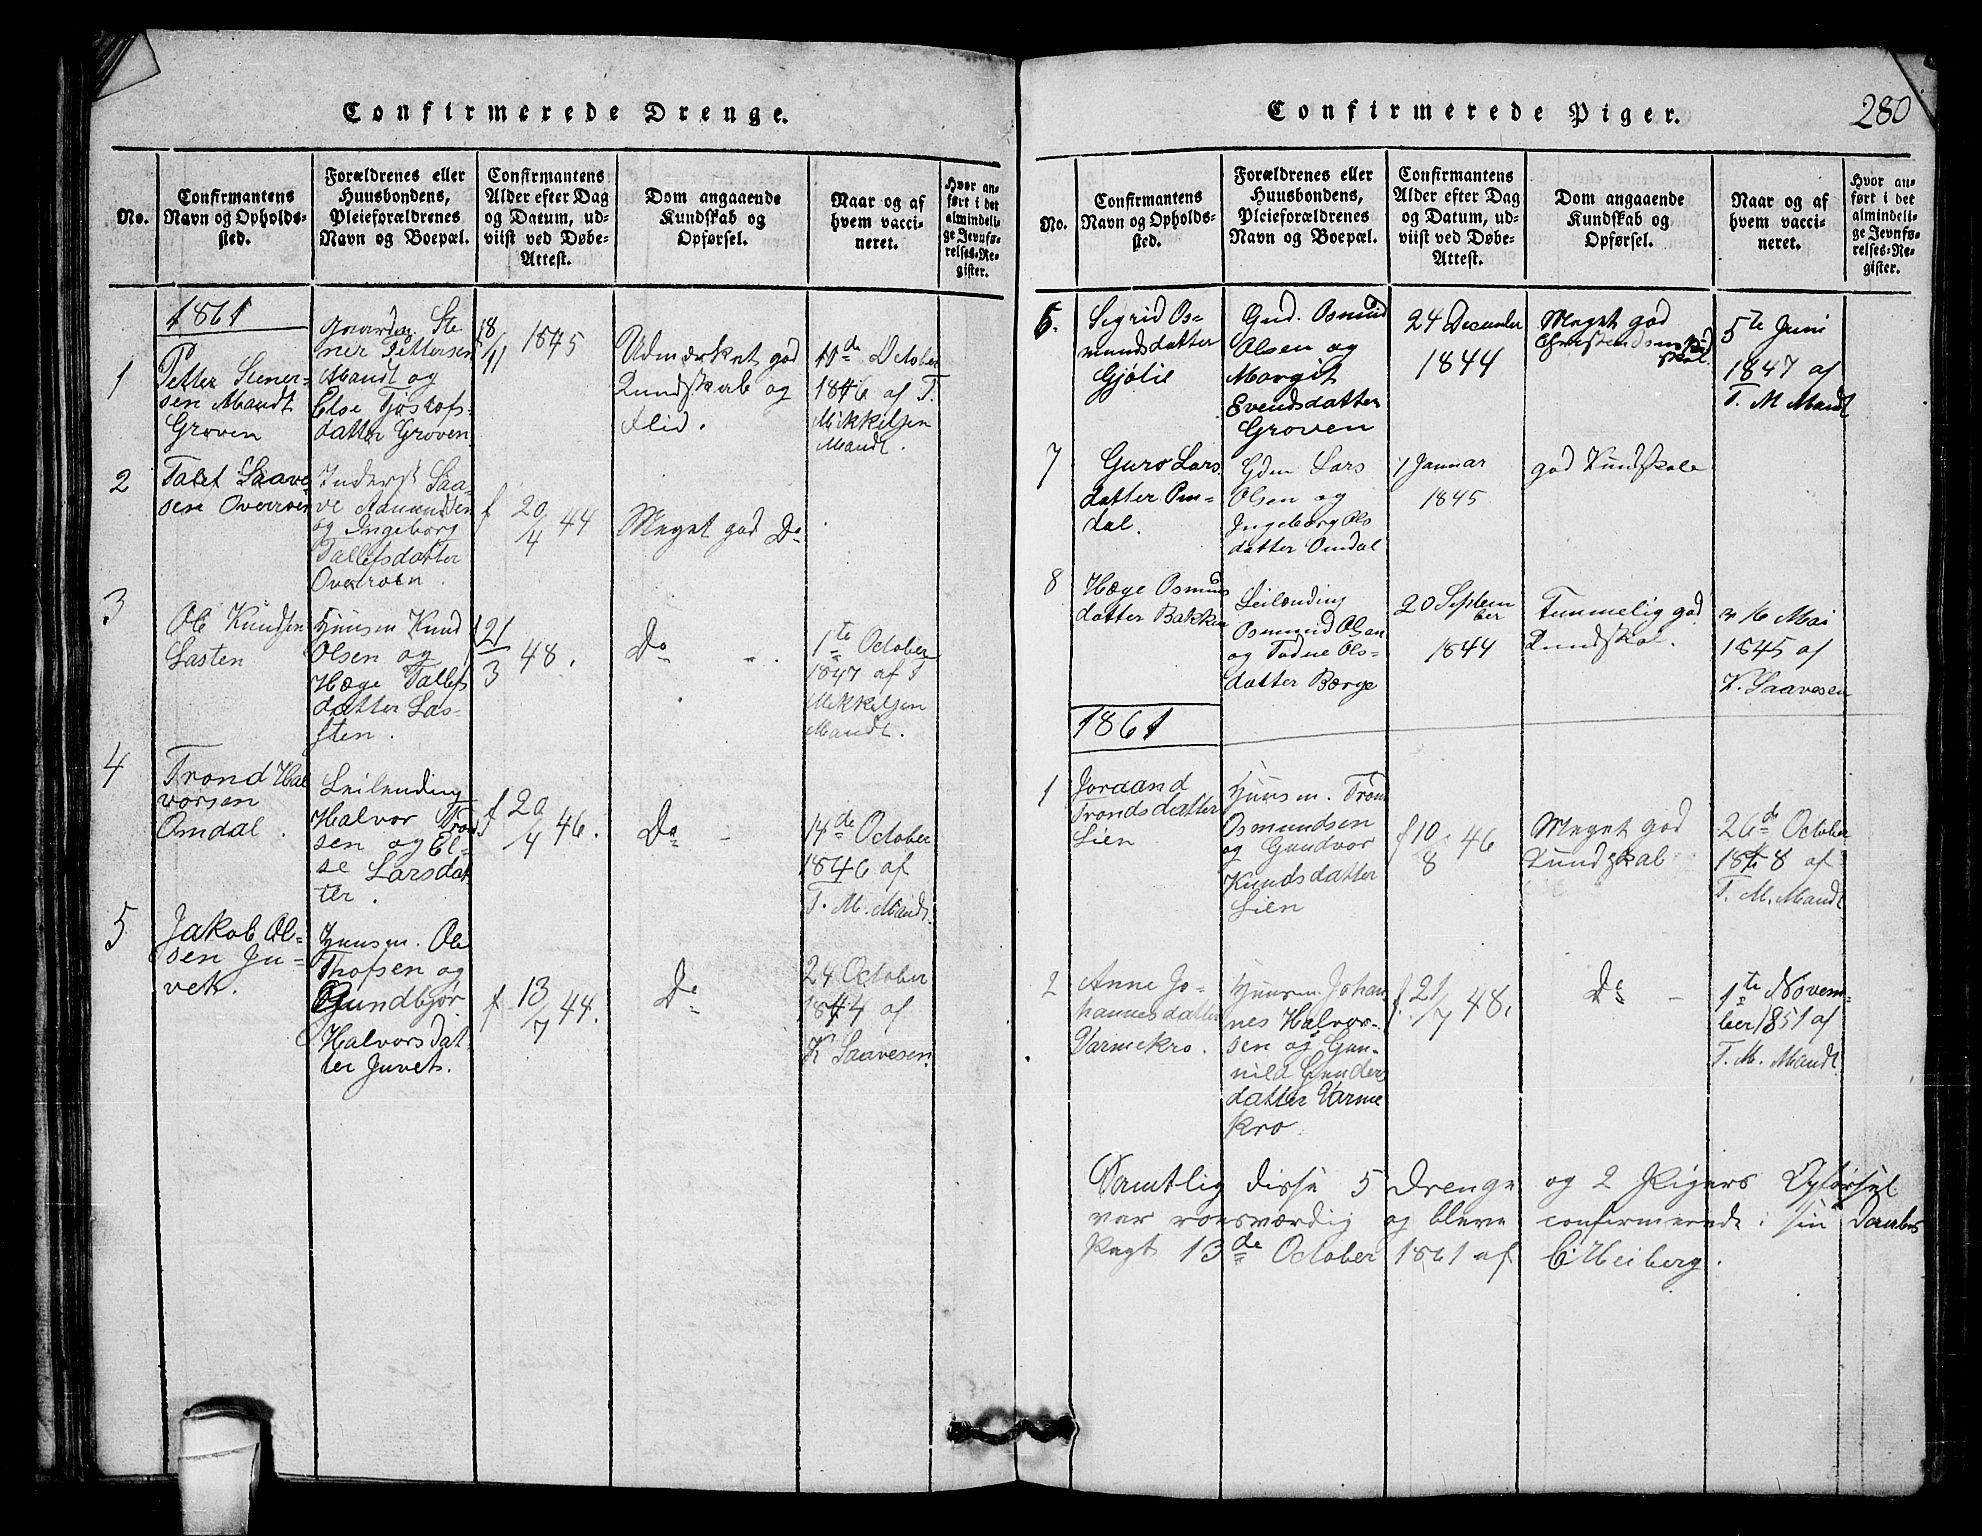 SAKO, Lårdal kirkebøker, G/Gb/L0001: Klokkerbok nr. II 1, 1815-1865, s. 280